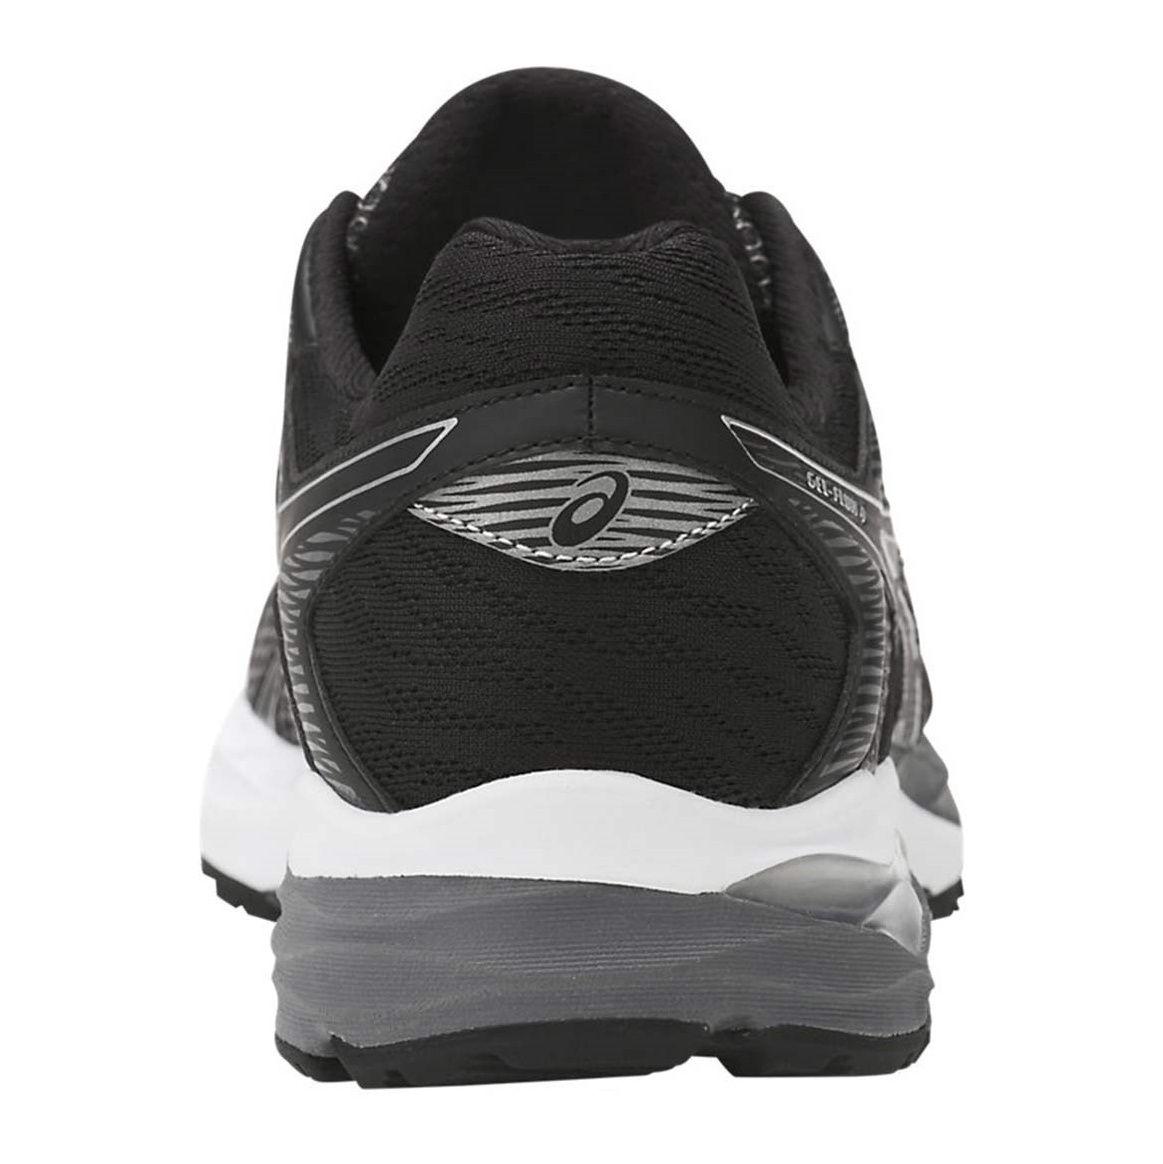 کفش دویدن بندی مردانه GEL-FLUX 4 - اسیکس - مشکي - 4